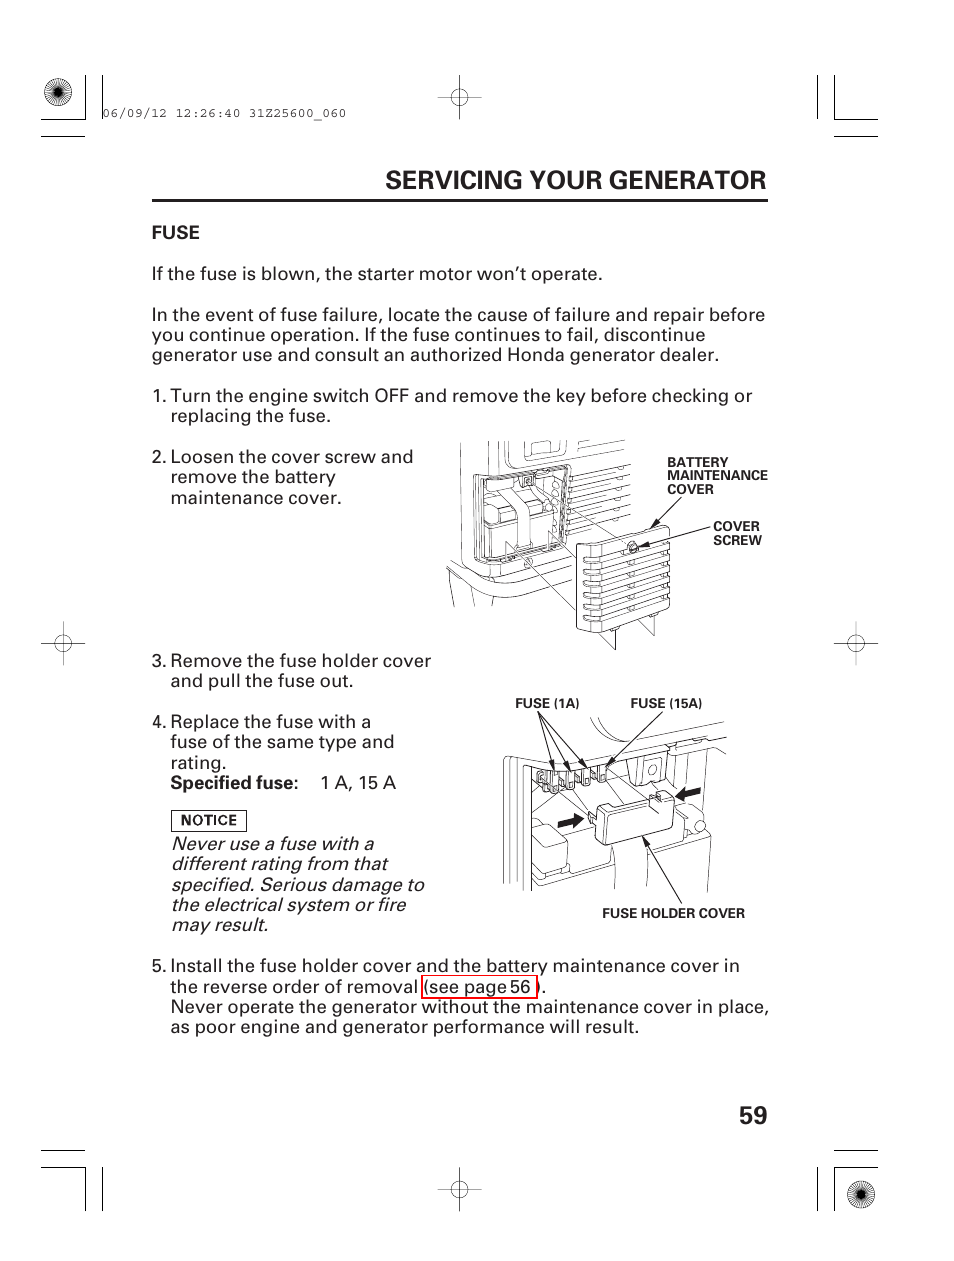 Honda 100 Fuse Holder Complete Wiring Diagrams 2012 Pilot Box 59 Servicing Your Generator Eu6500is User Manual Rh Manualsdir Com 2002 Cr V Civic Fuses